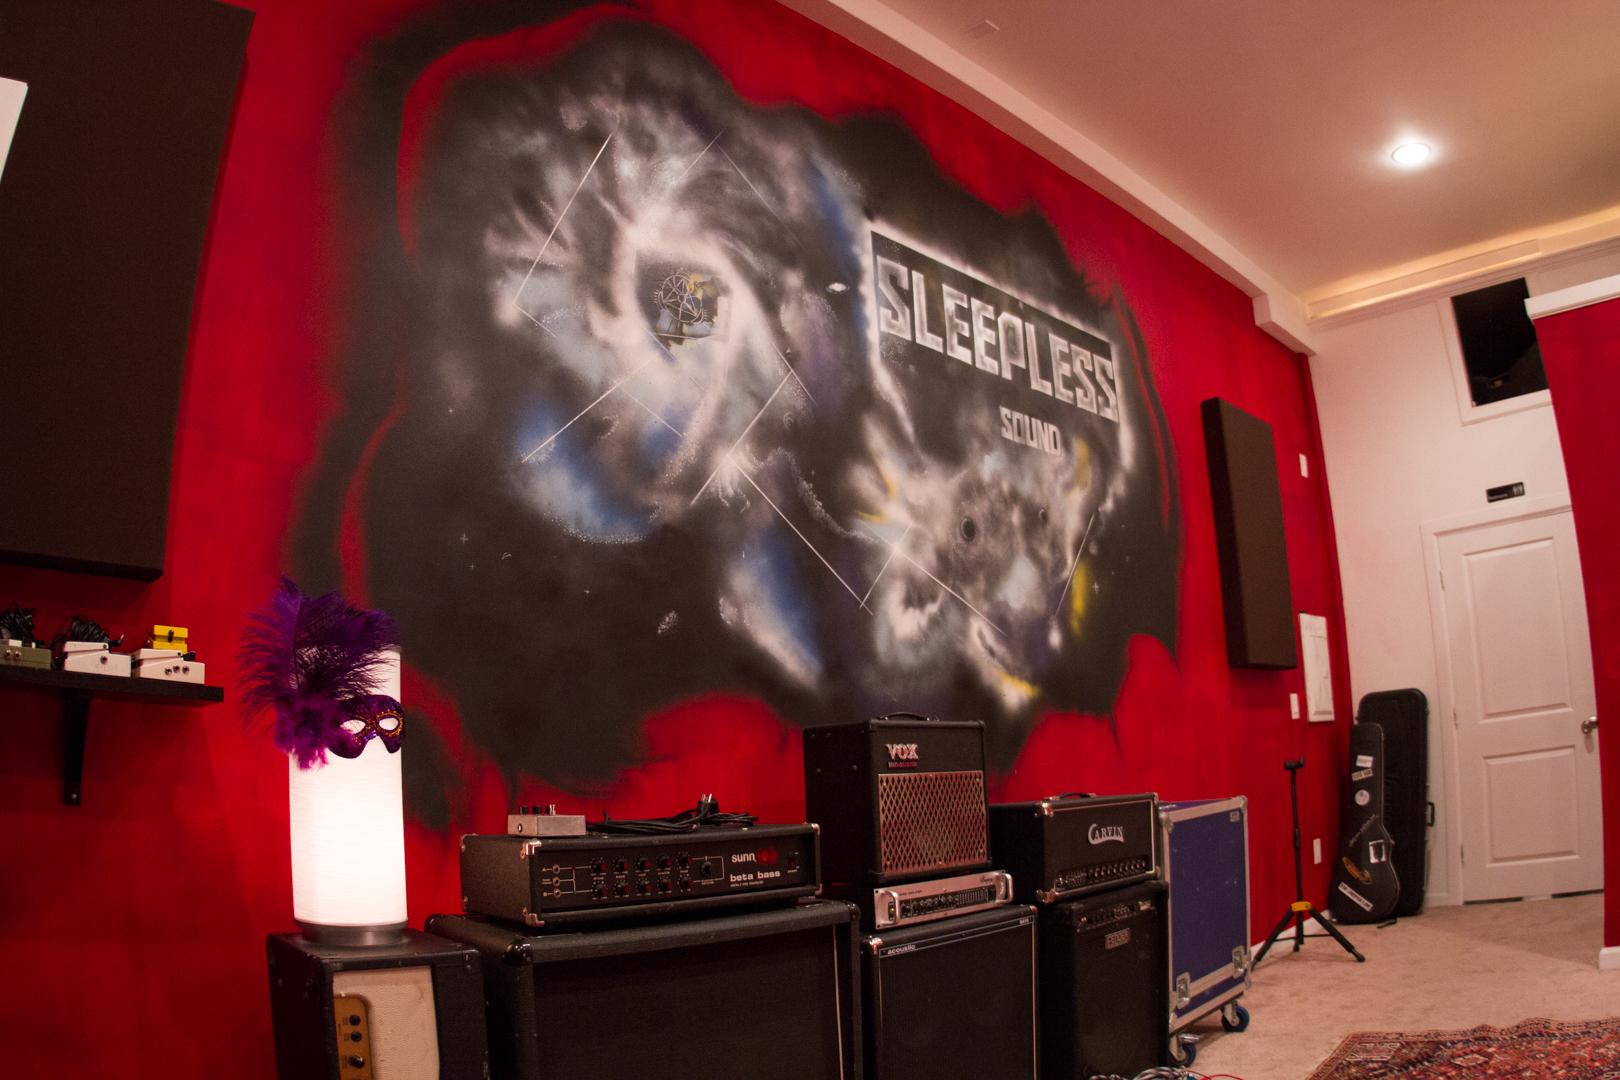 Sleepless-0021.jpg